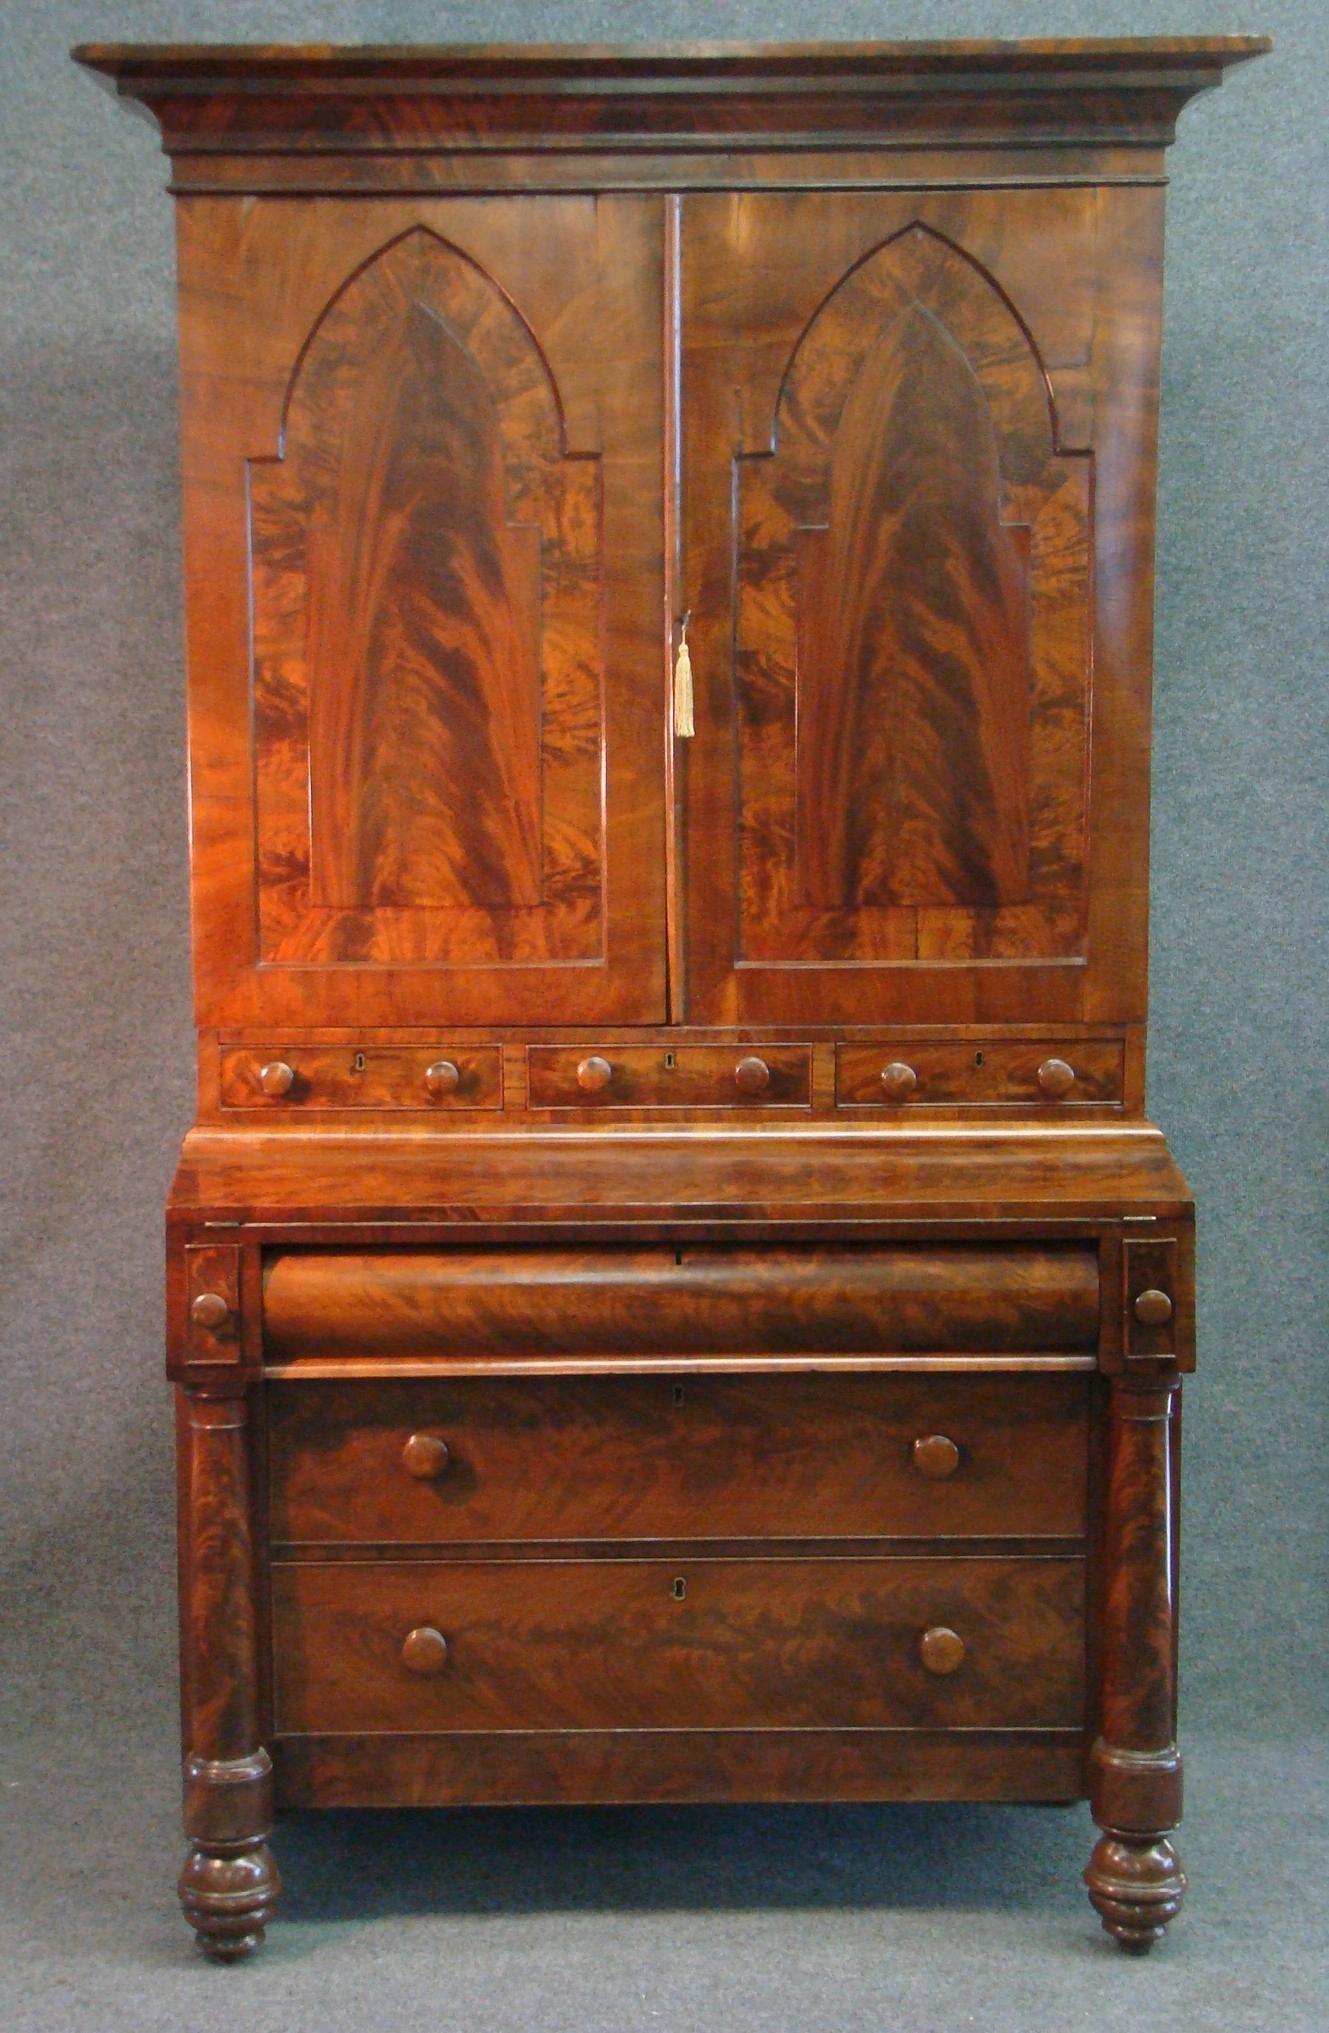 Fine Early 19th C American Classical New York Mahogany Mahogany Veneer Secretary For Sale